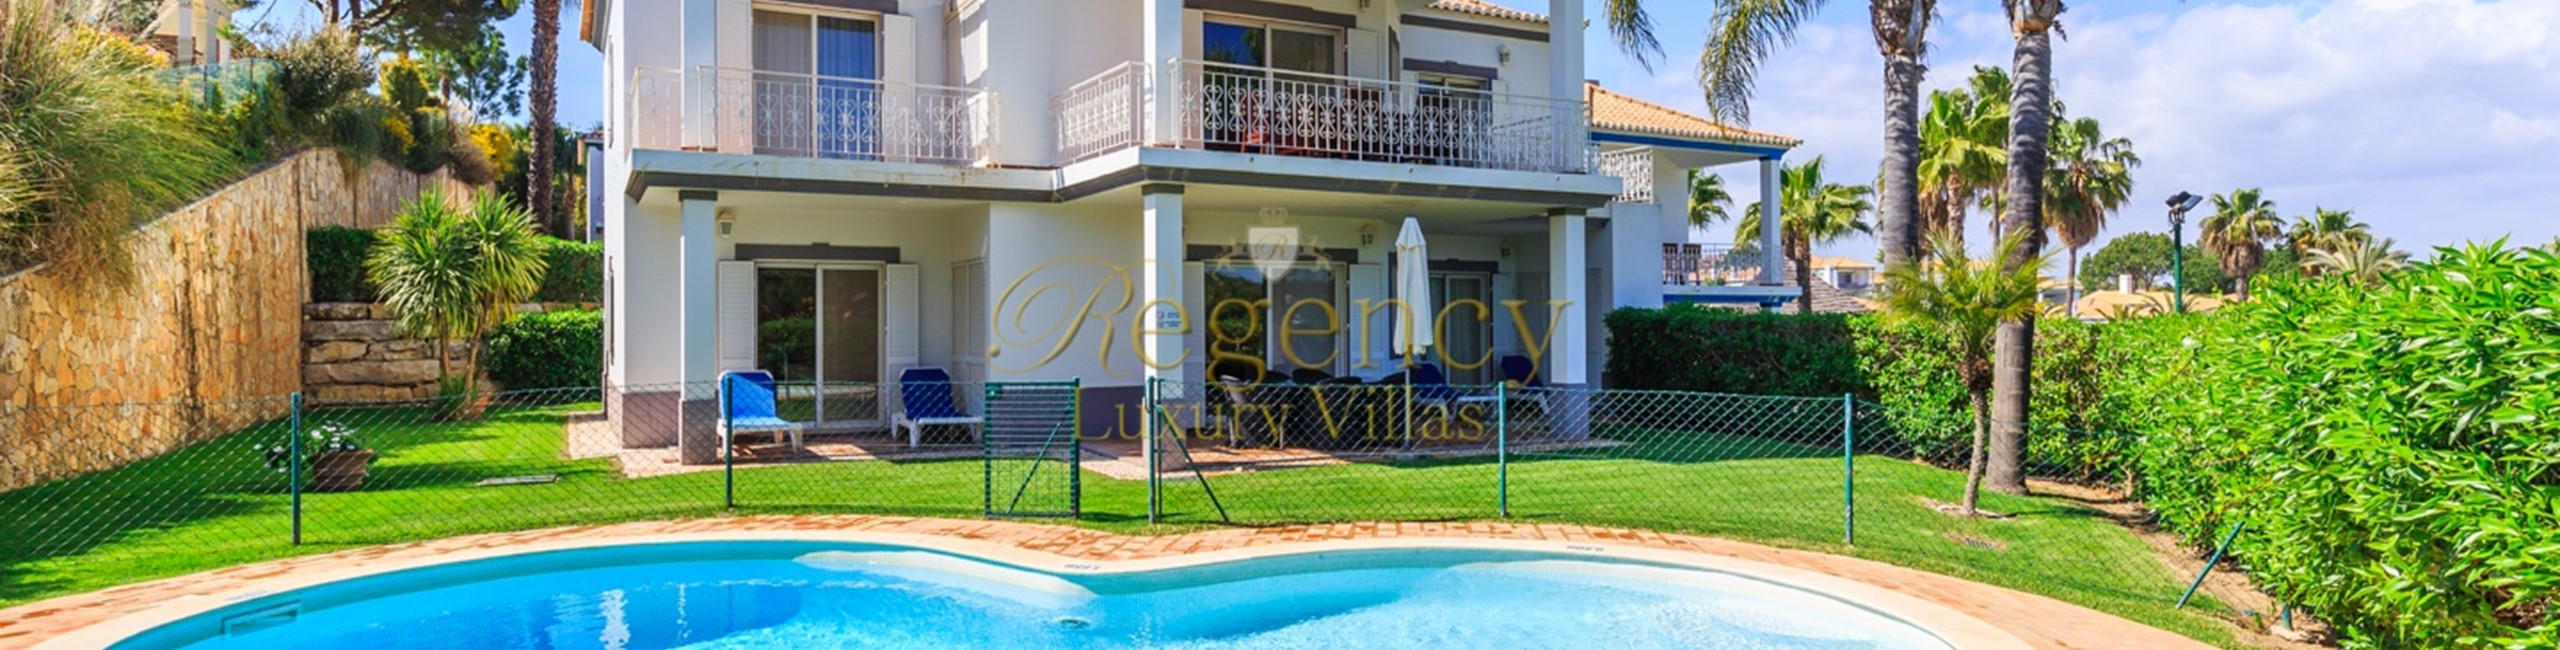 Quinta Do Lago 3 Bedroom Property To Rent